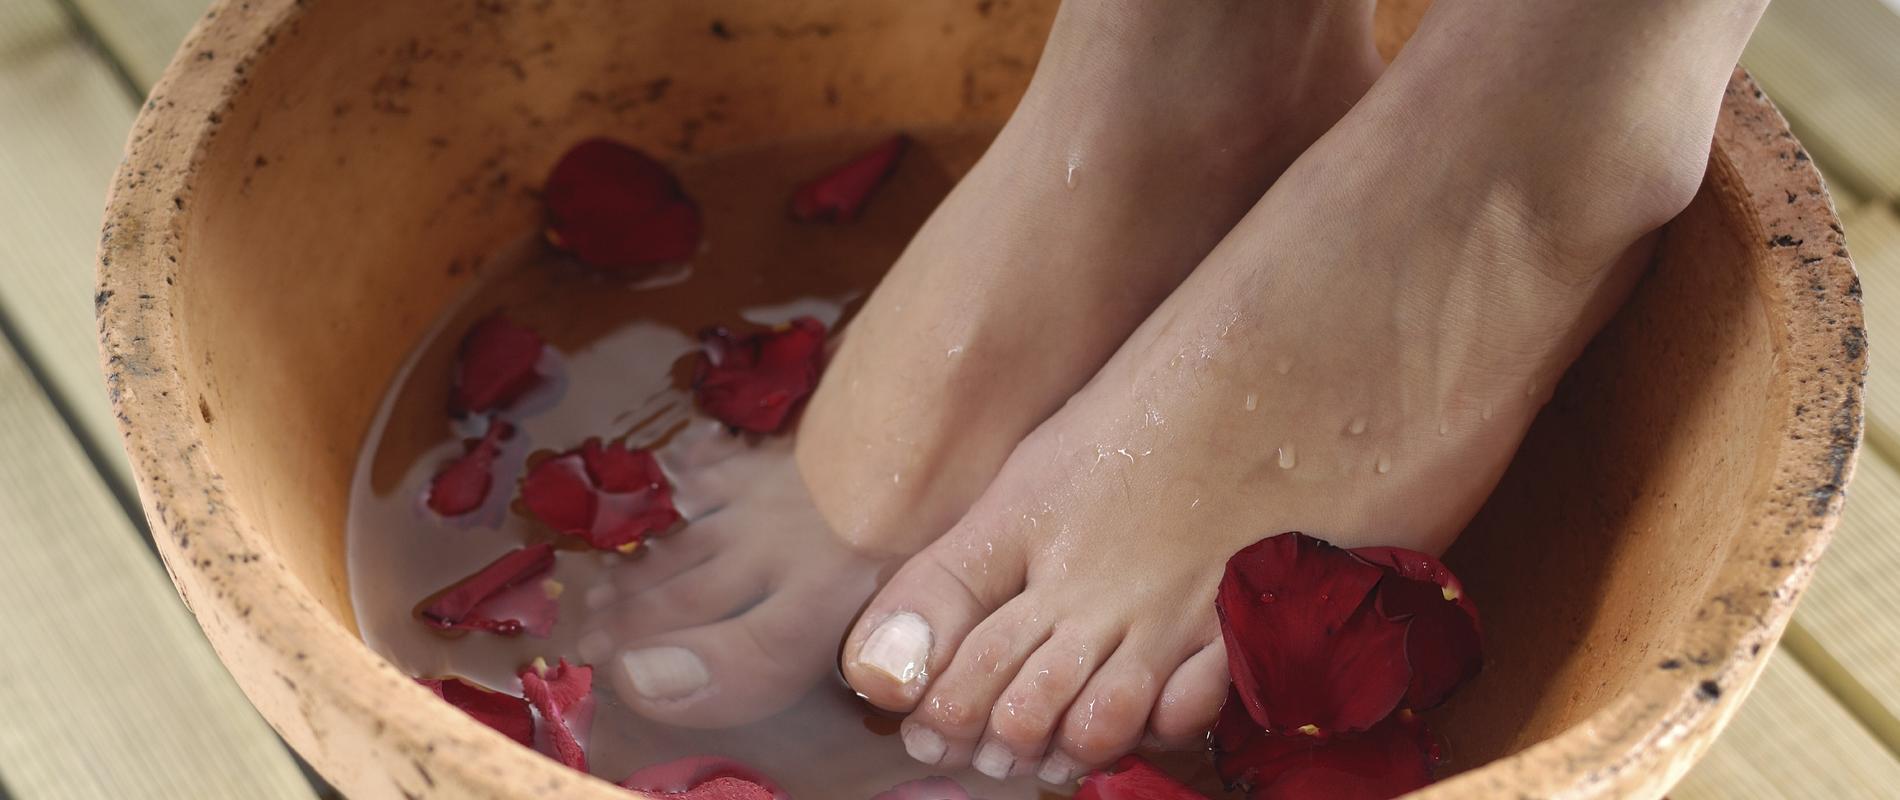 Bain de pied - image